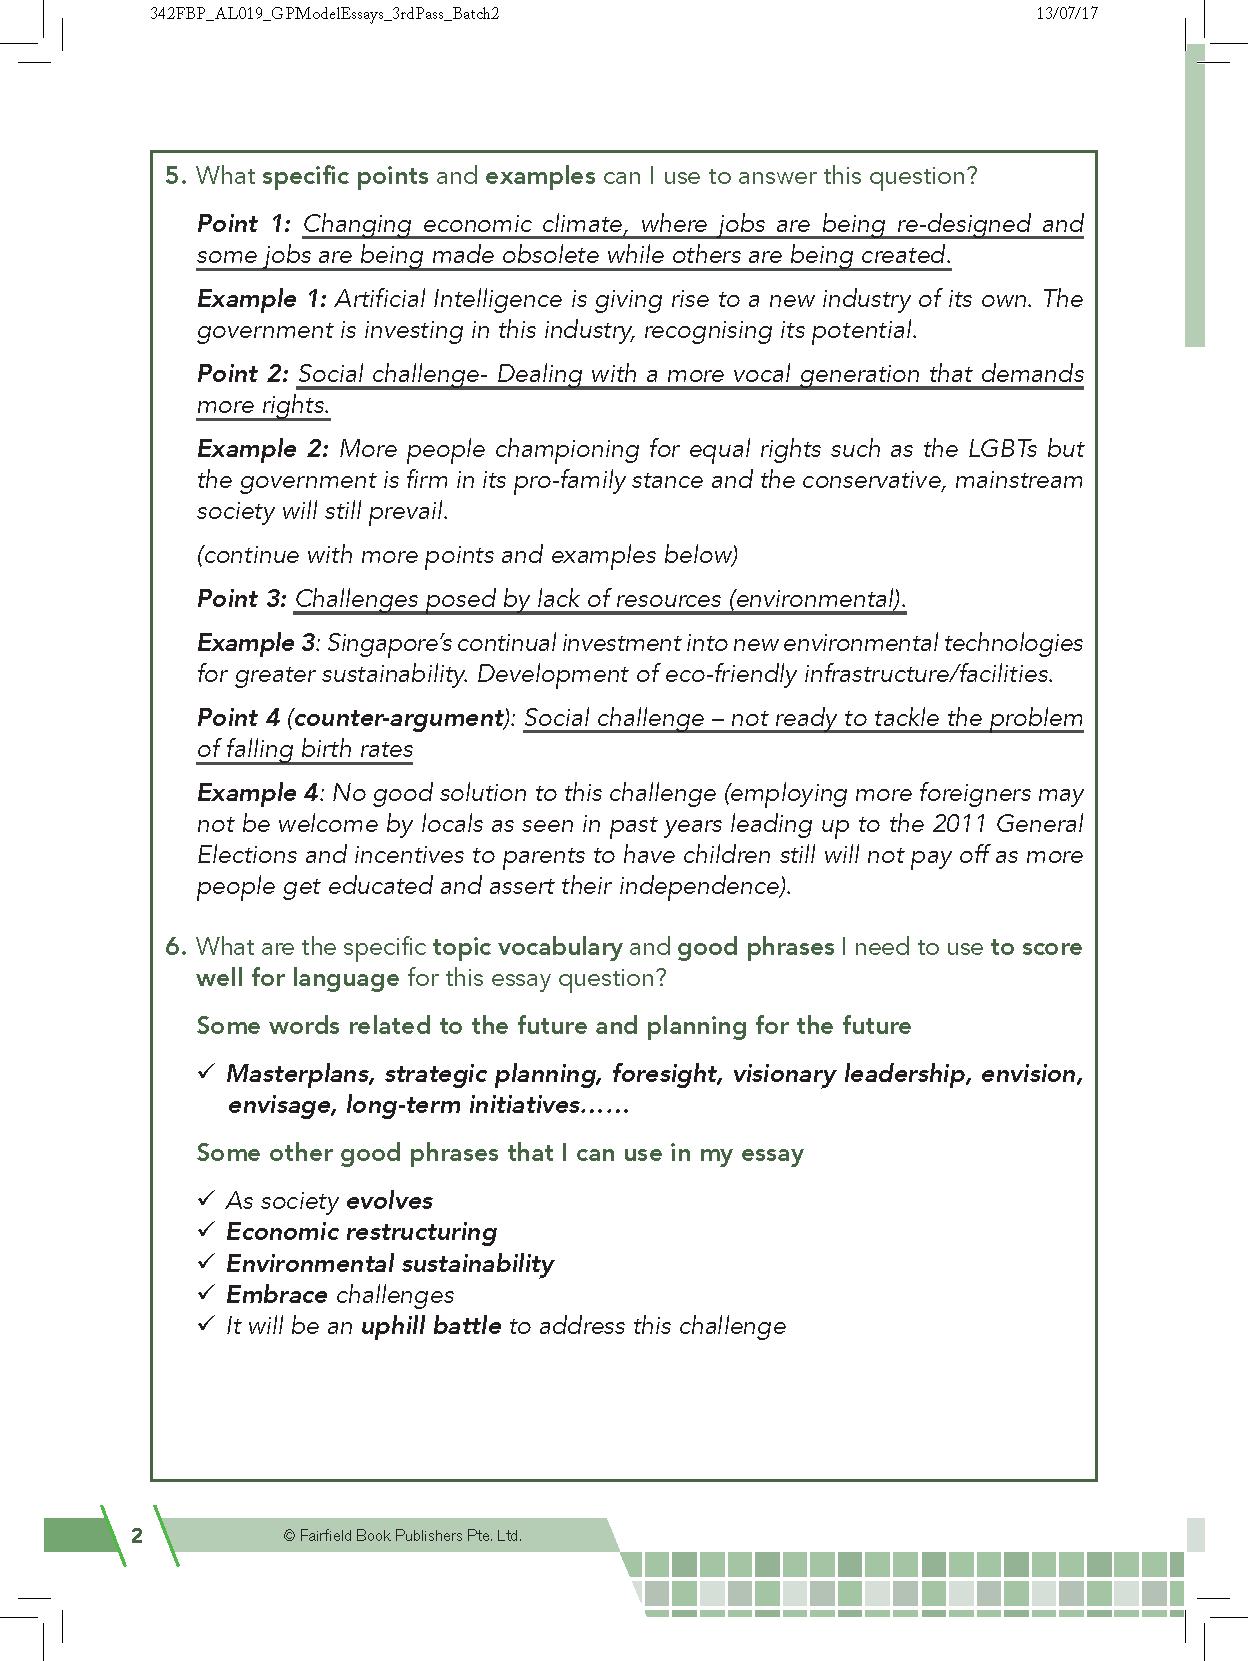 Qualitative dissertation chapter 5